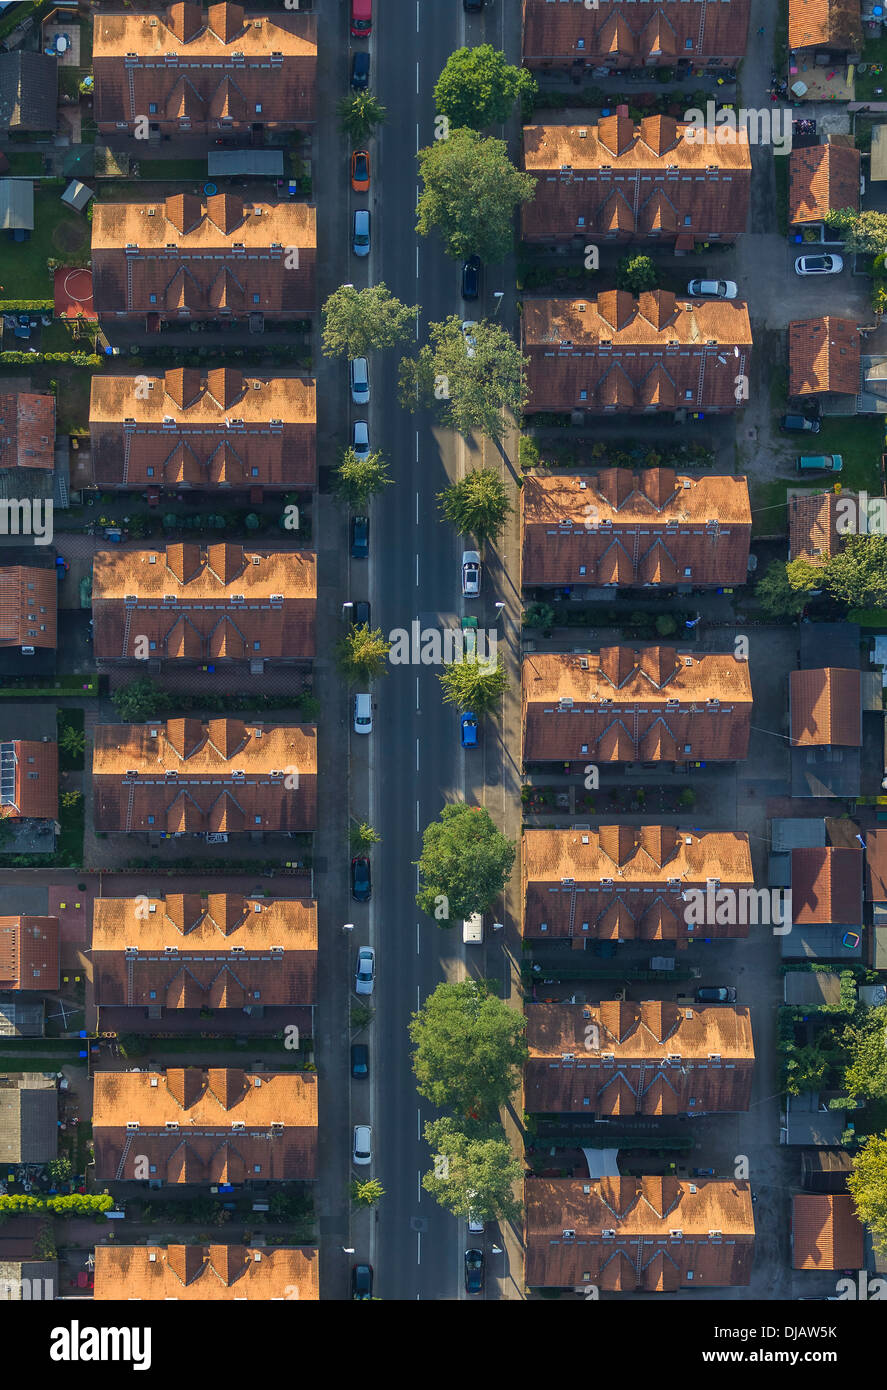 Aerial view, miners settlement, terraced houses, Rentfort, Gladbeck, North Rhine-Westphalia, Germany - Stock Image